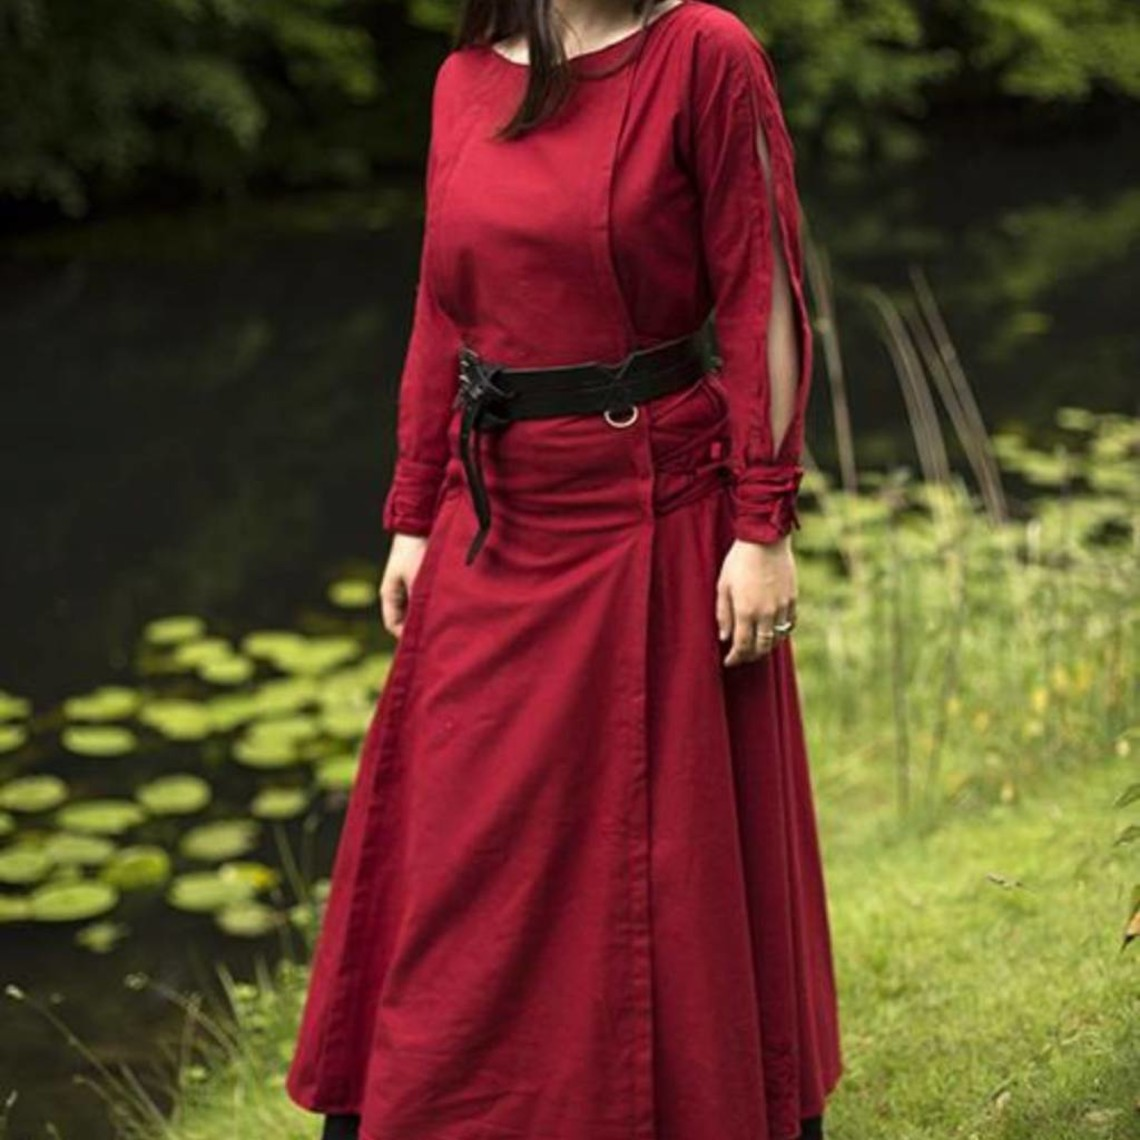 Epic Armoury Vestido morgaine, rojo